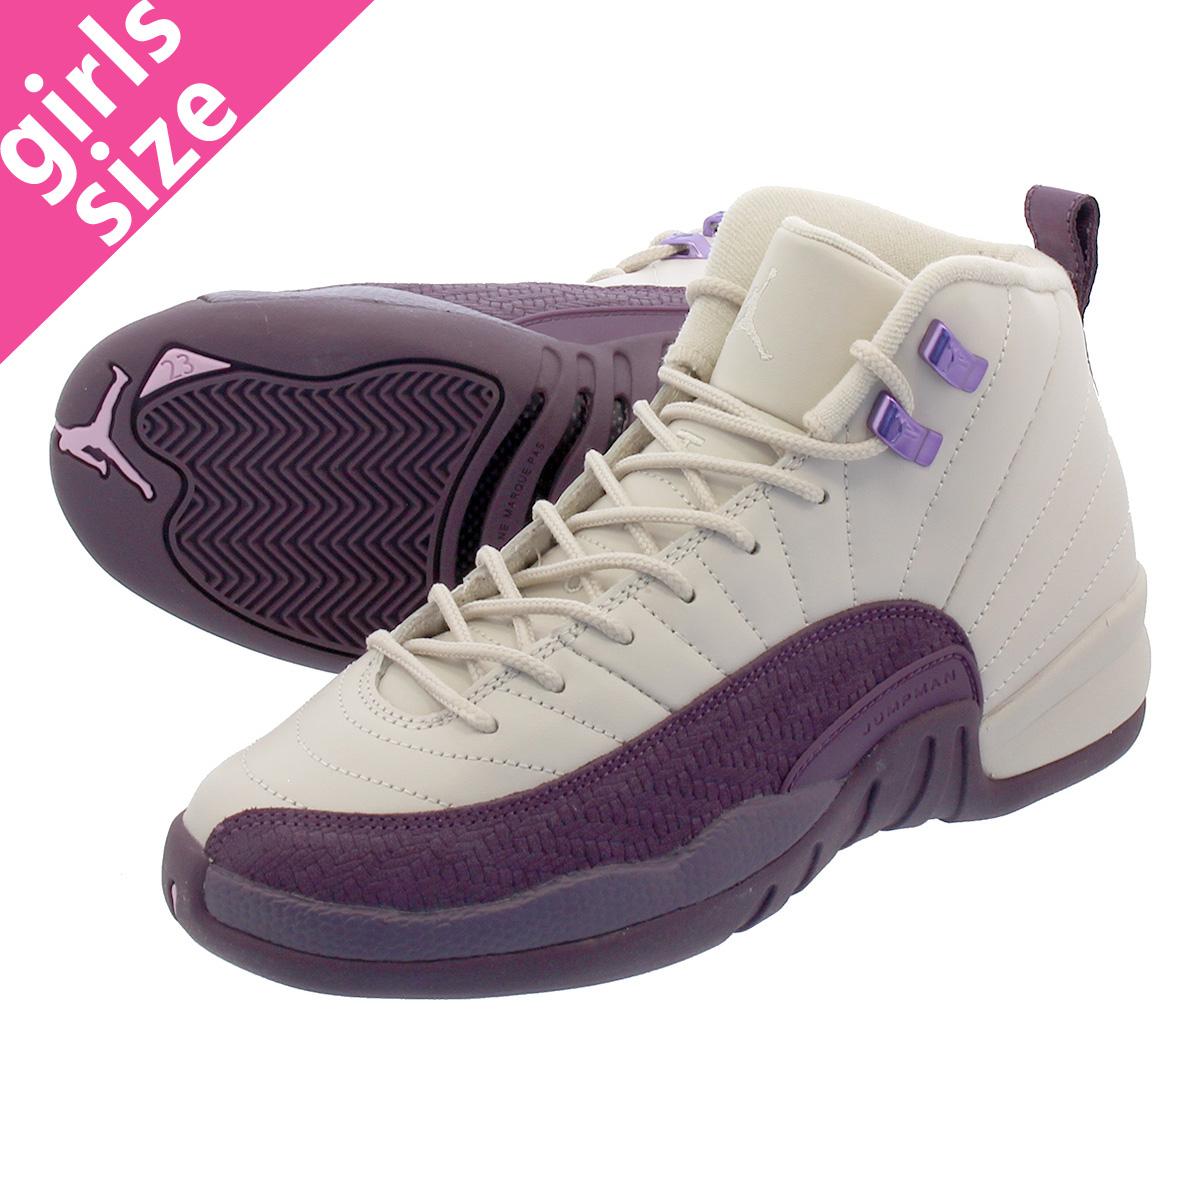 low priced d85f4 5ee66 NIKE AIR JORDAN 12 RETRO GS Nike Air Jordan 12 nostalgic GS DESERT  SAND/DESERT SAND/PRO PURPLE 510,815-001